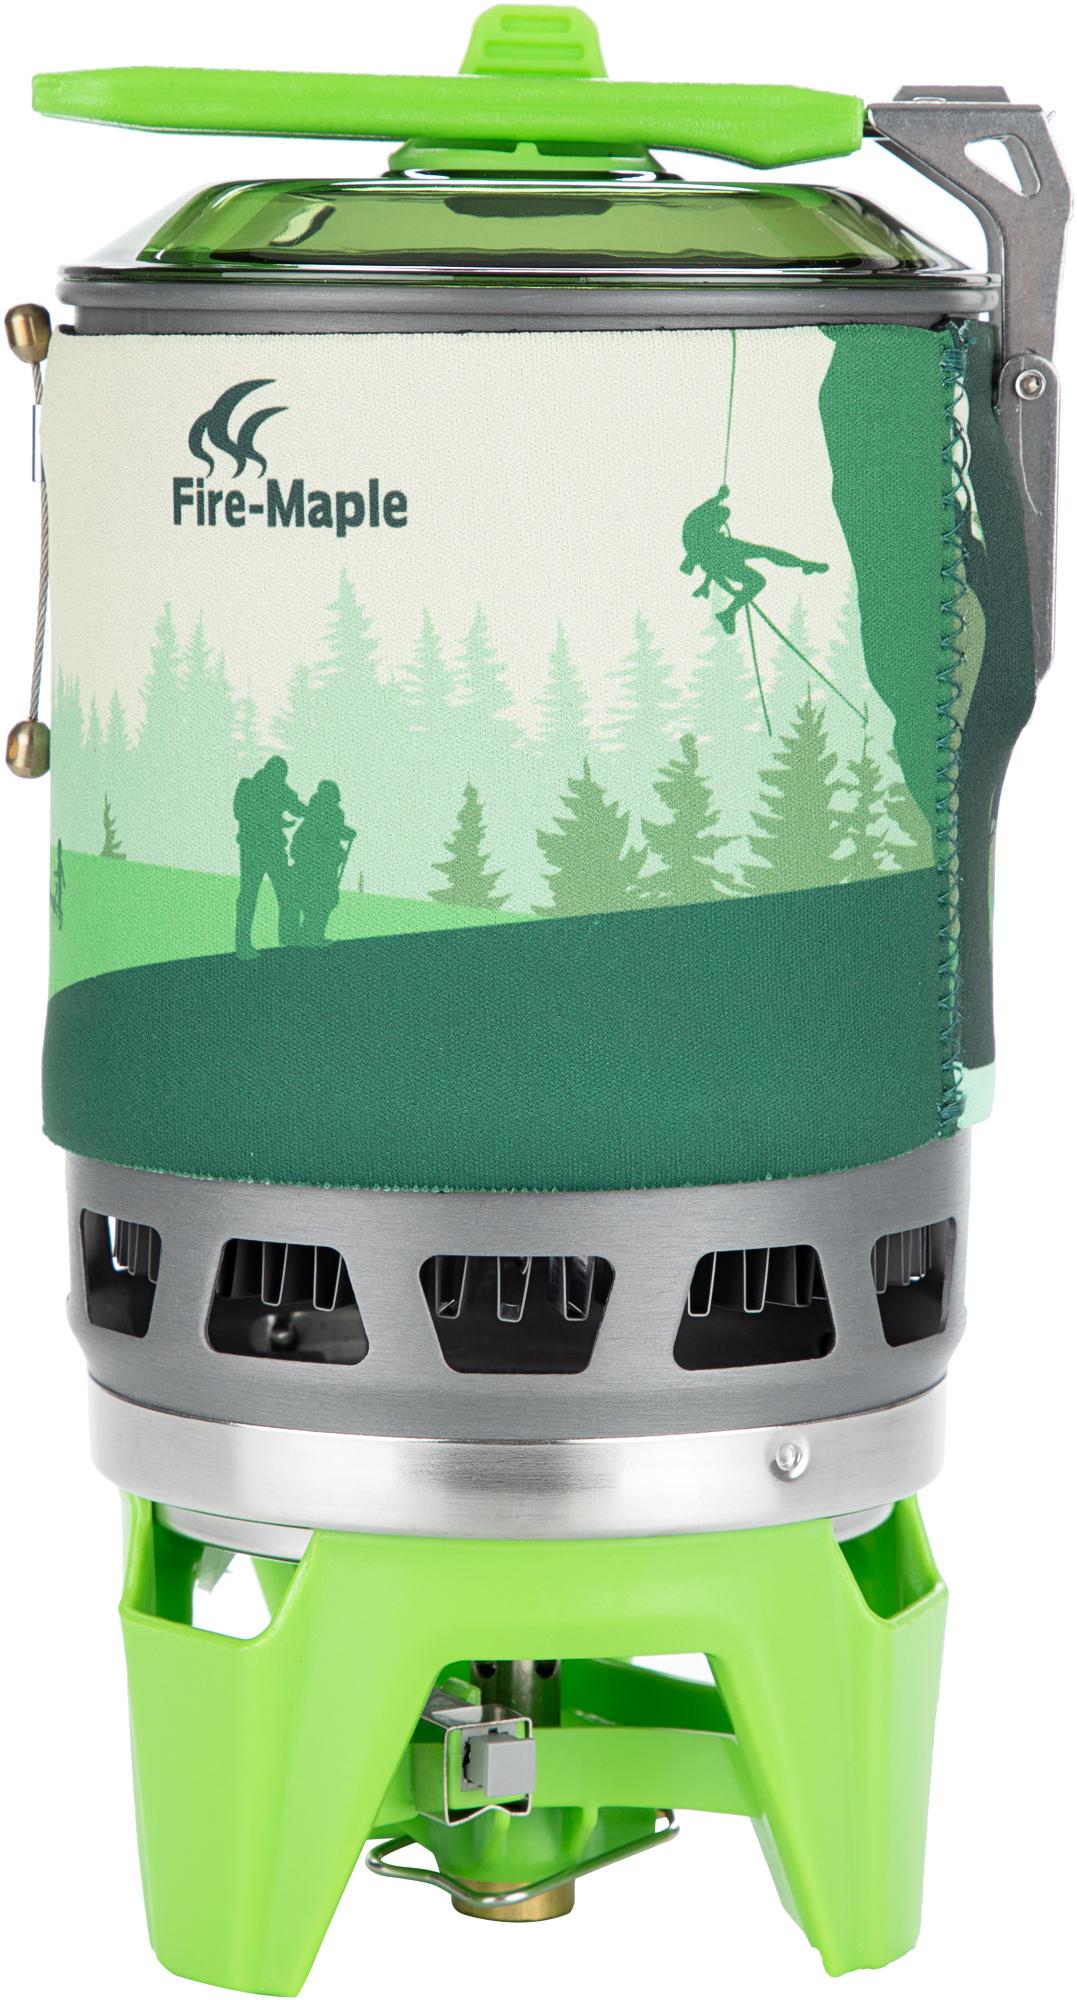 Fire-Maple Газовая горелка Fire-Maple набор посуды fire maple fire maple титановой horizon 1